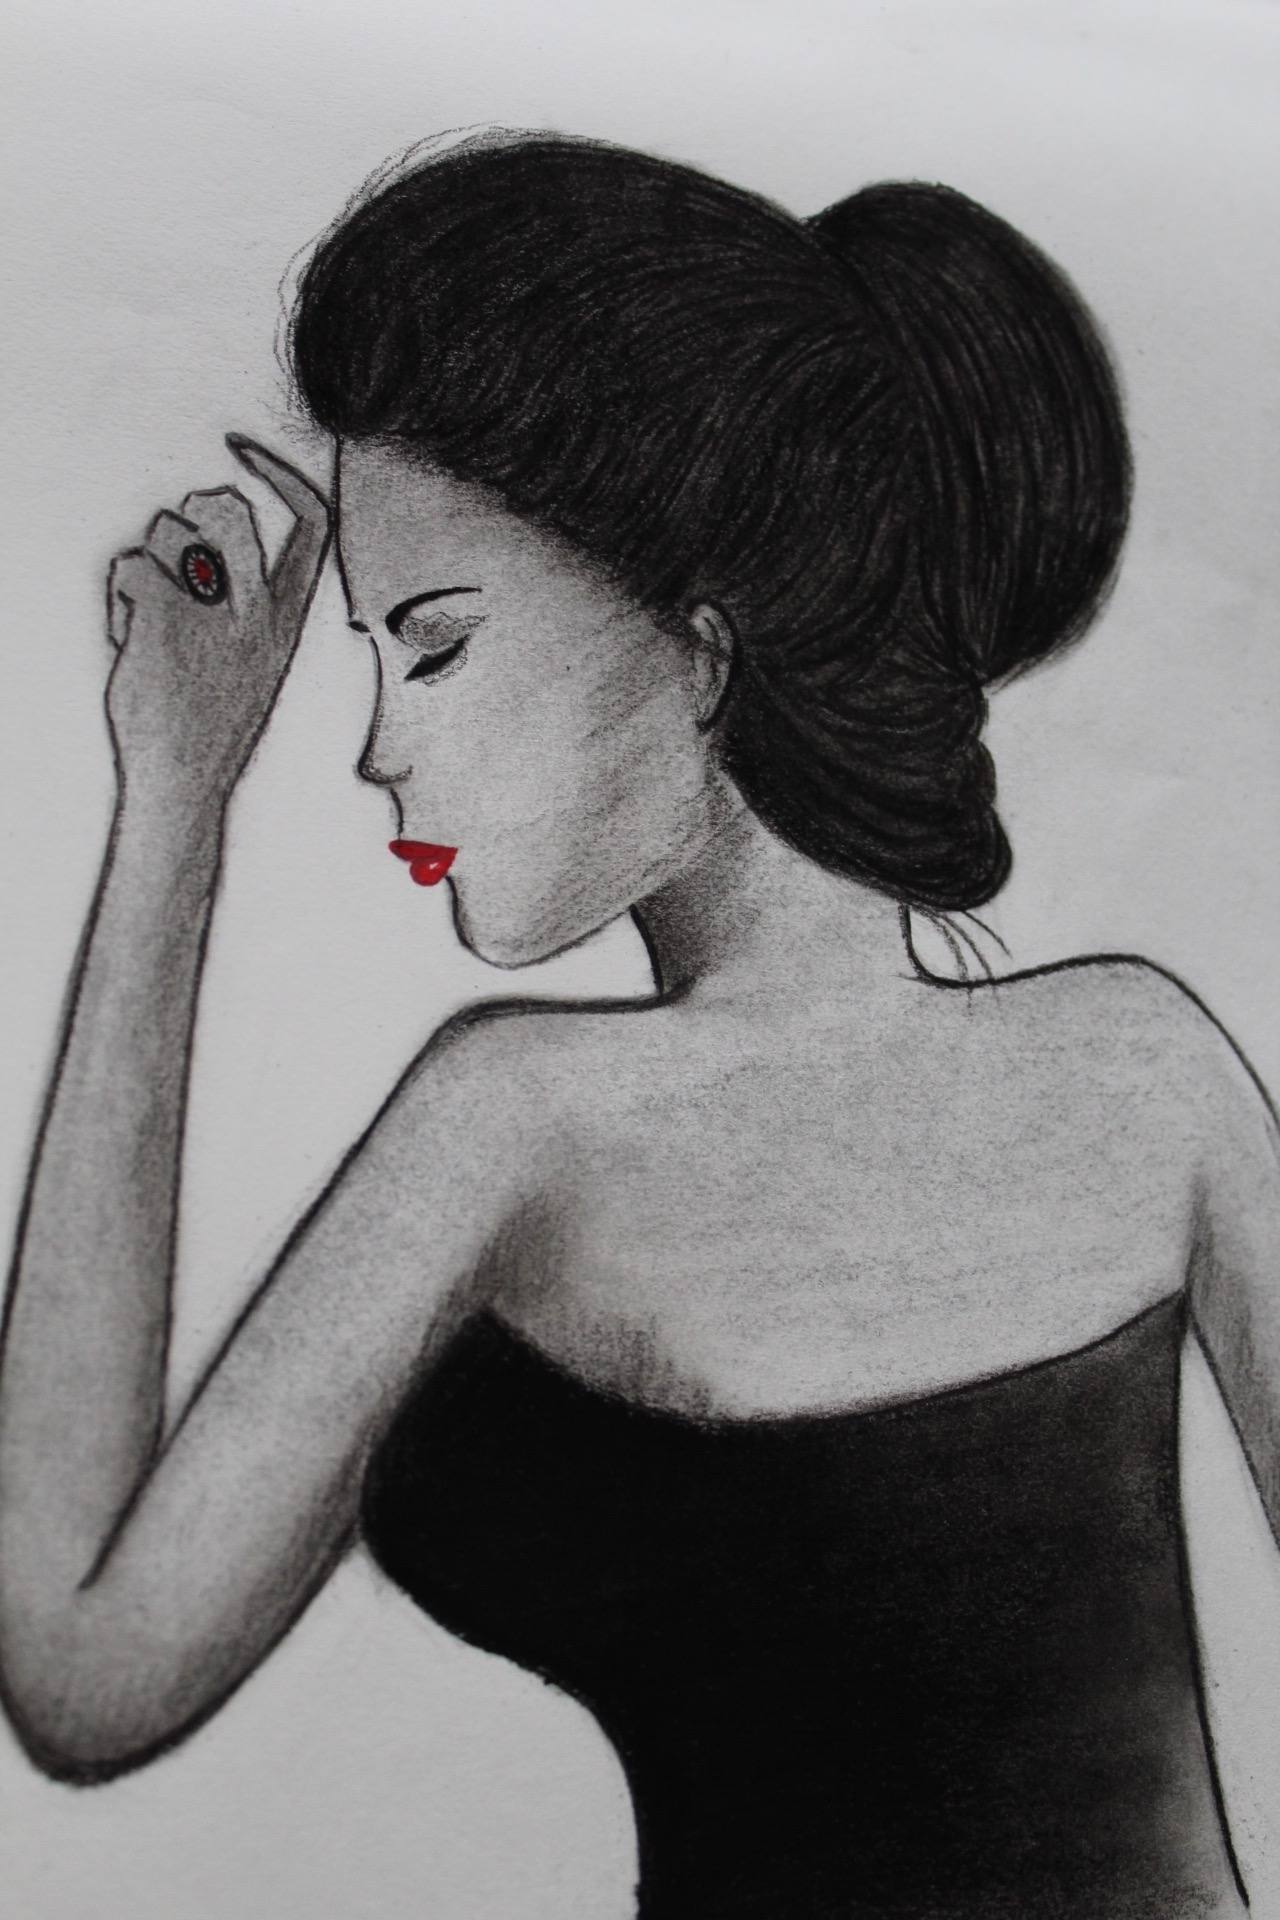 A GIRL Charcoal Sketch art Pencil, art, charcoal, handmade, girl